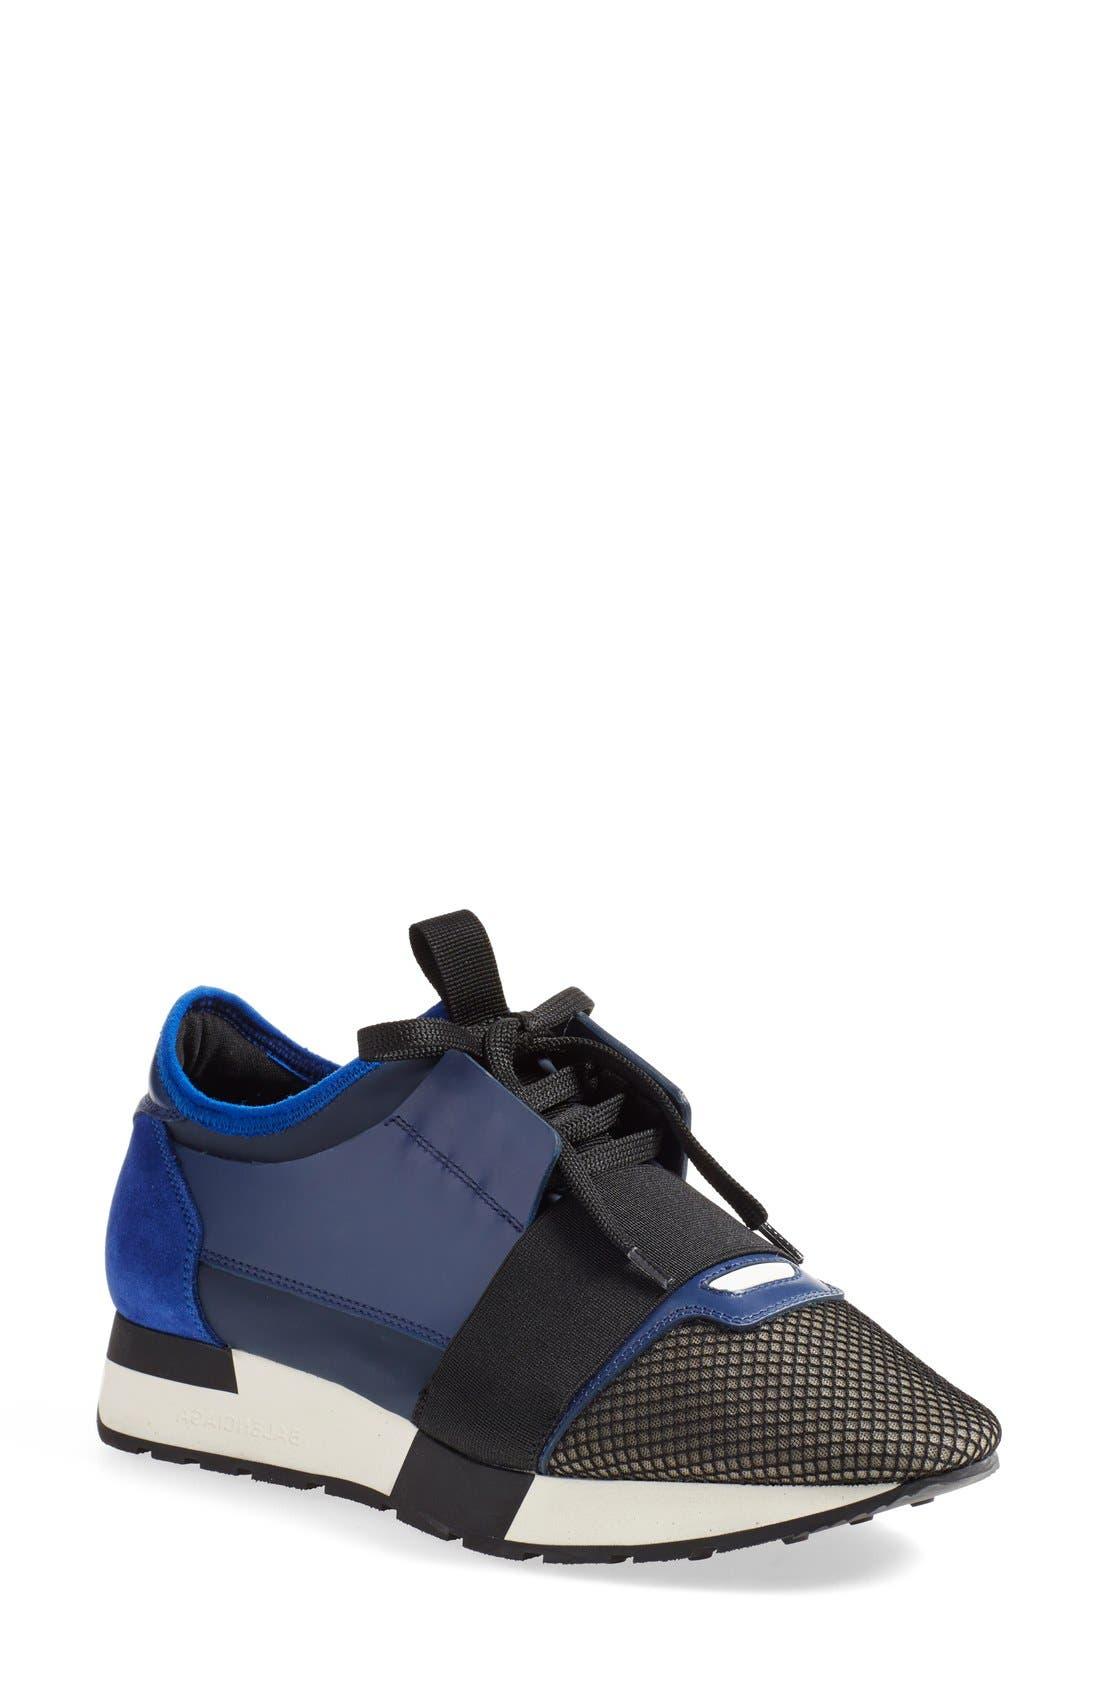 Main Image - Balenciaga Mixed Media Sneaker (Women)